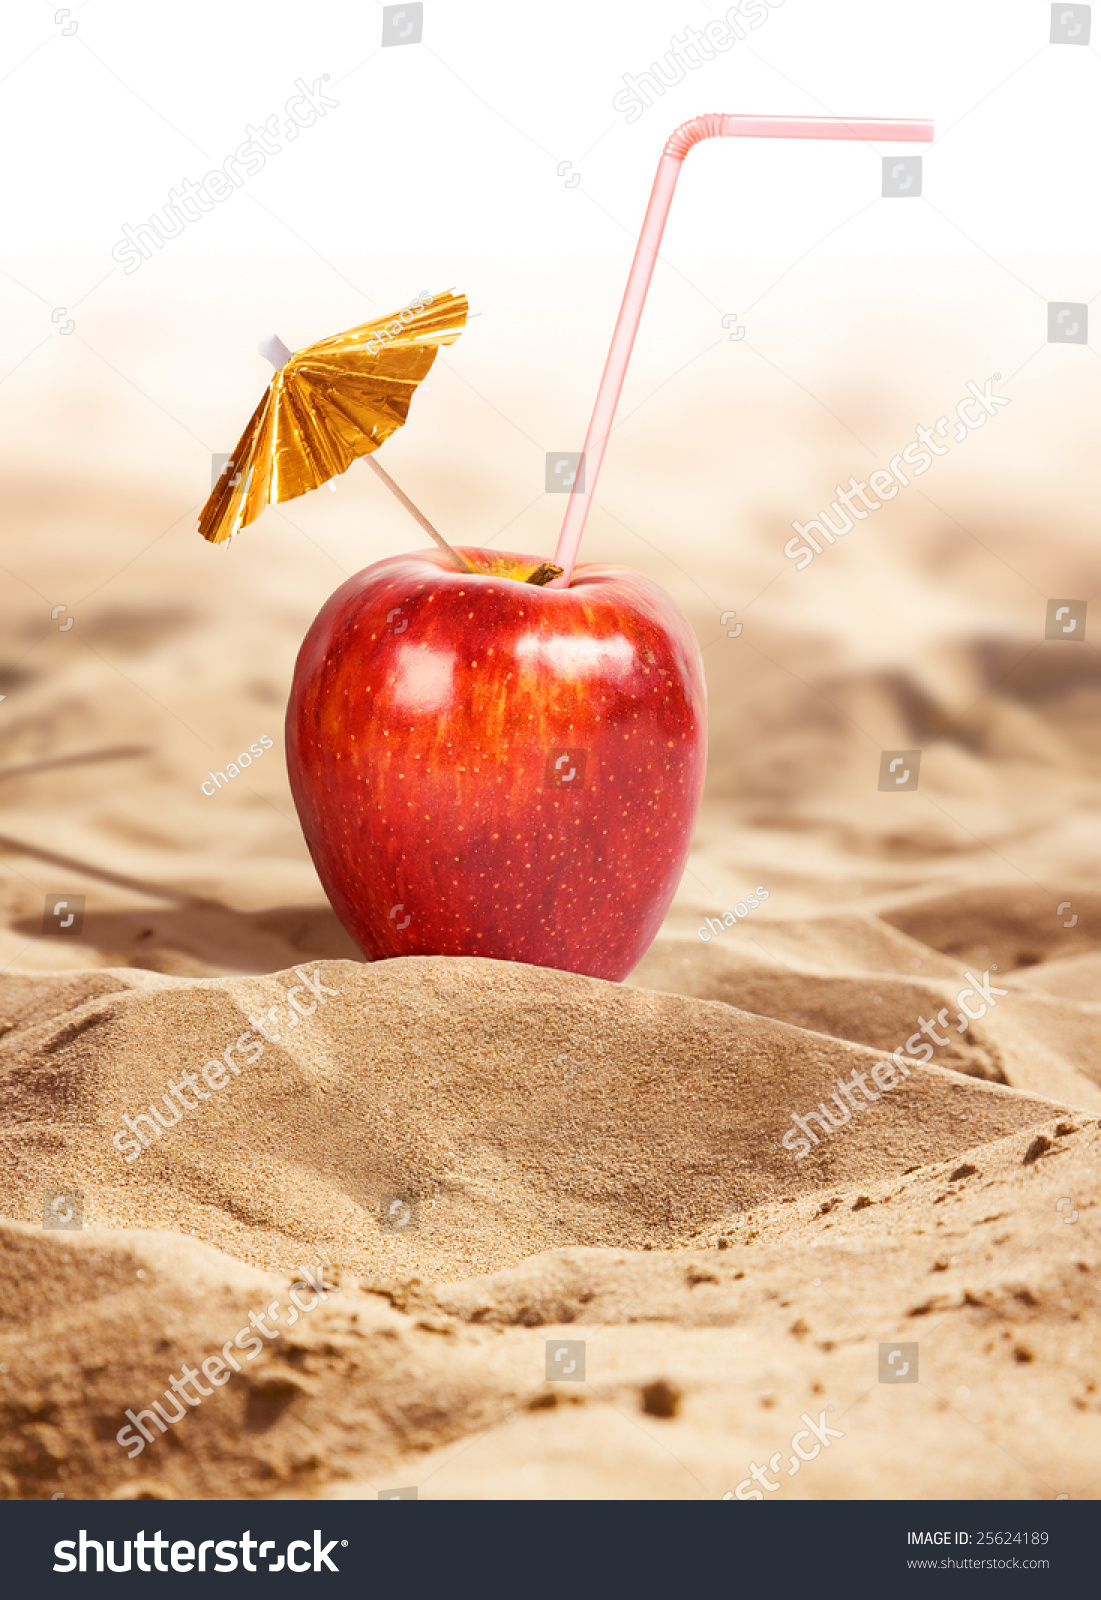 Apple Cocktail Hot Desert Stock Photo Shutterstock - A hot desert